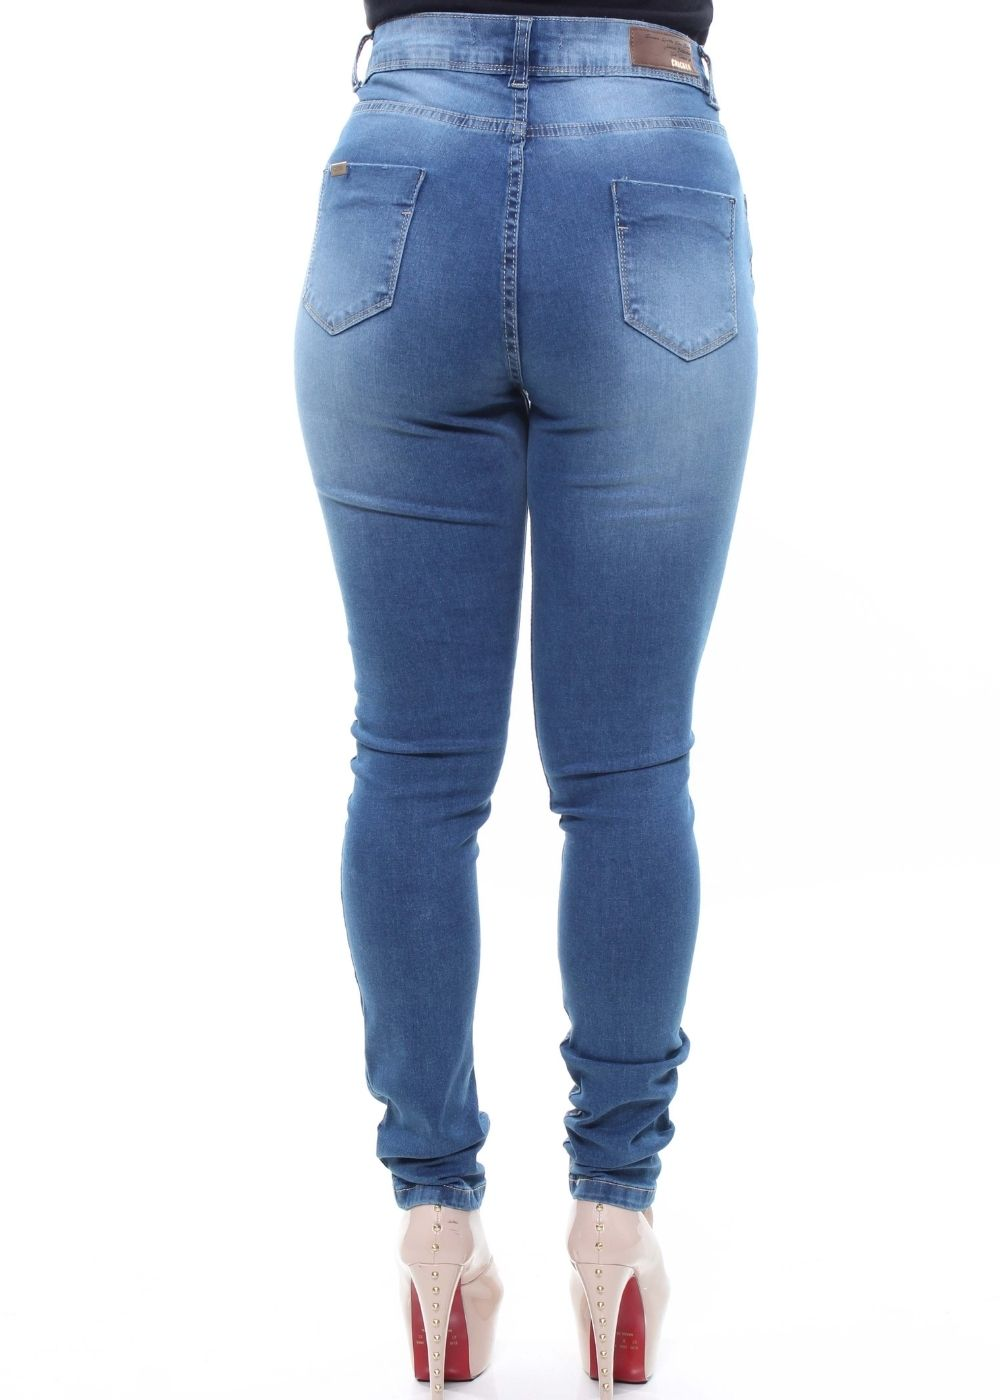 Calça Jeans Feminina Skinny Destroyed Crocker - 47644  - CROCKER JEANS